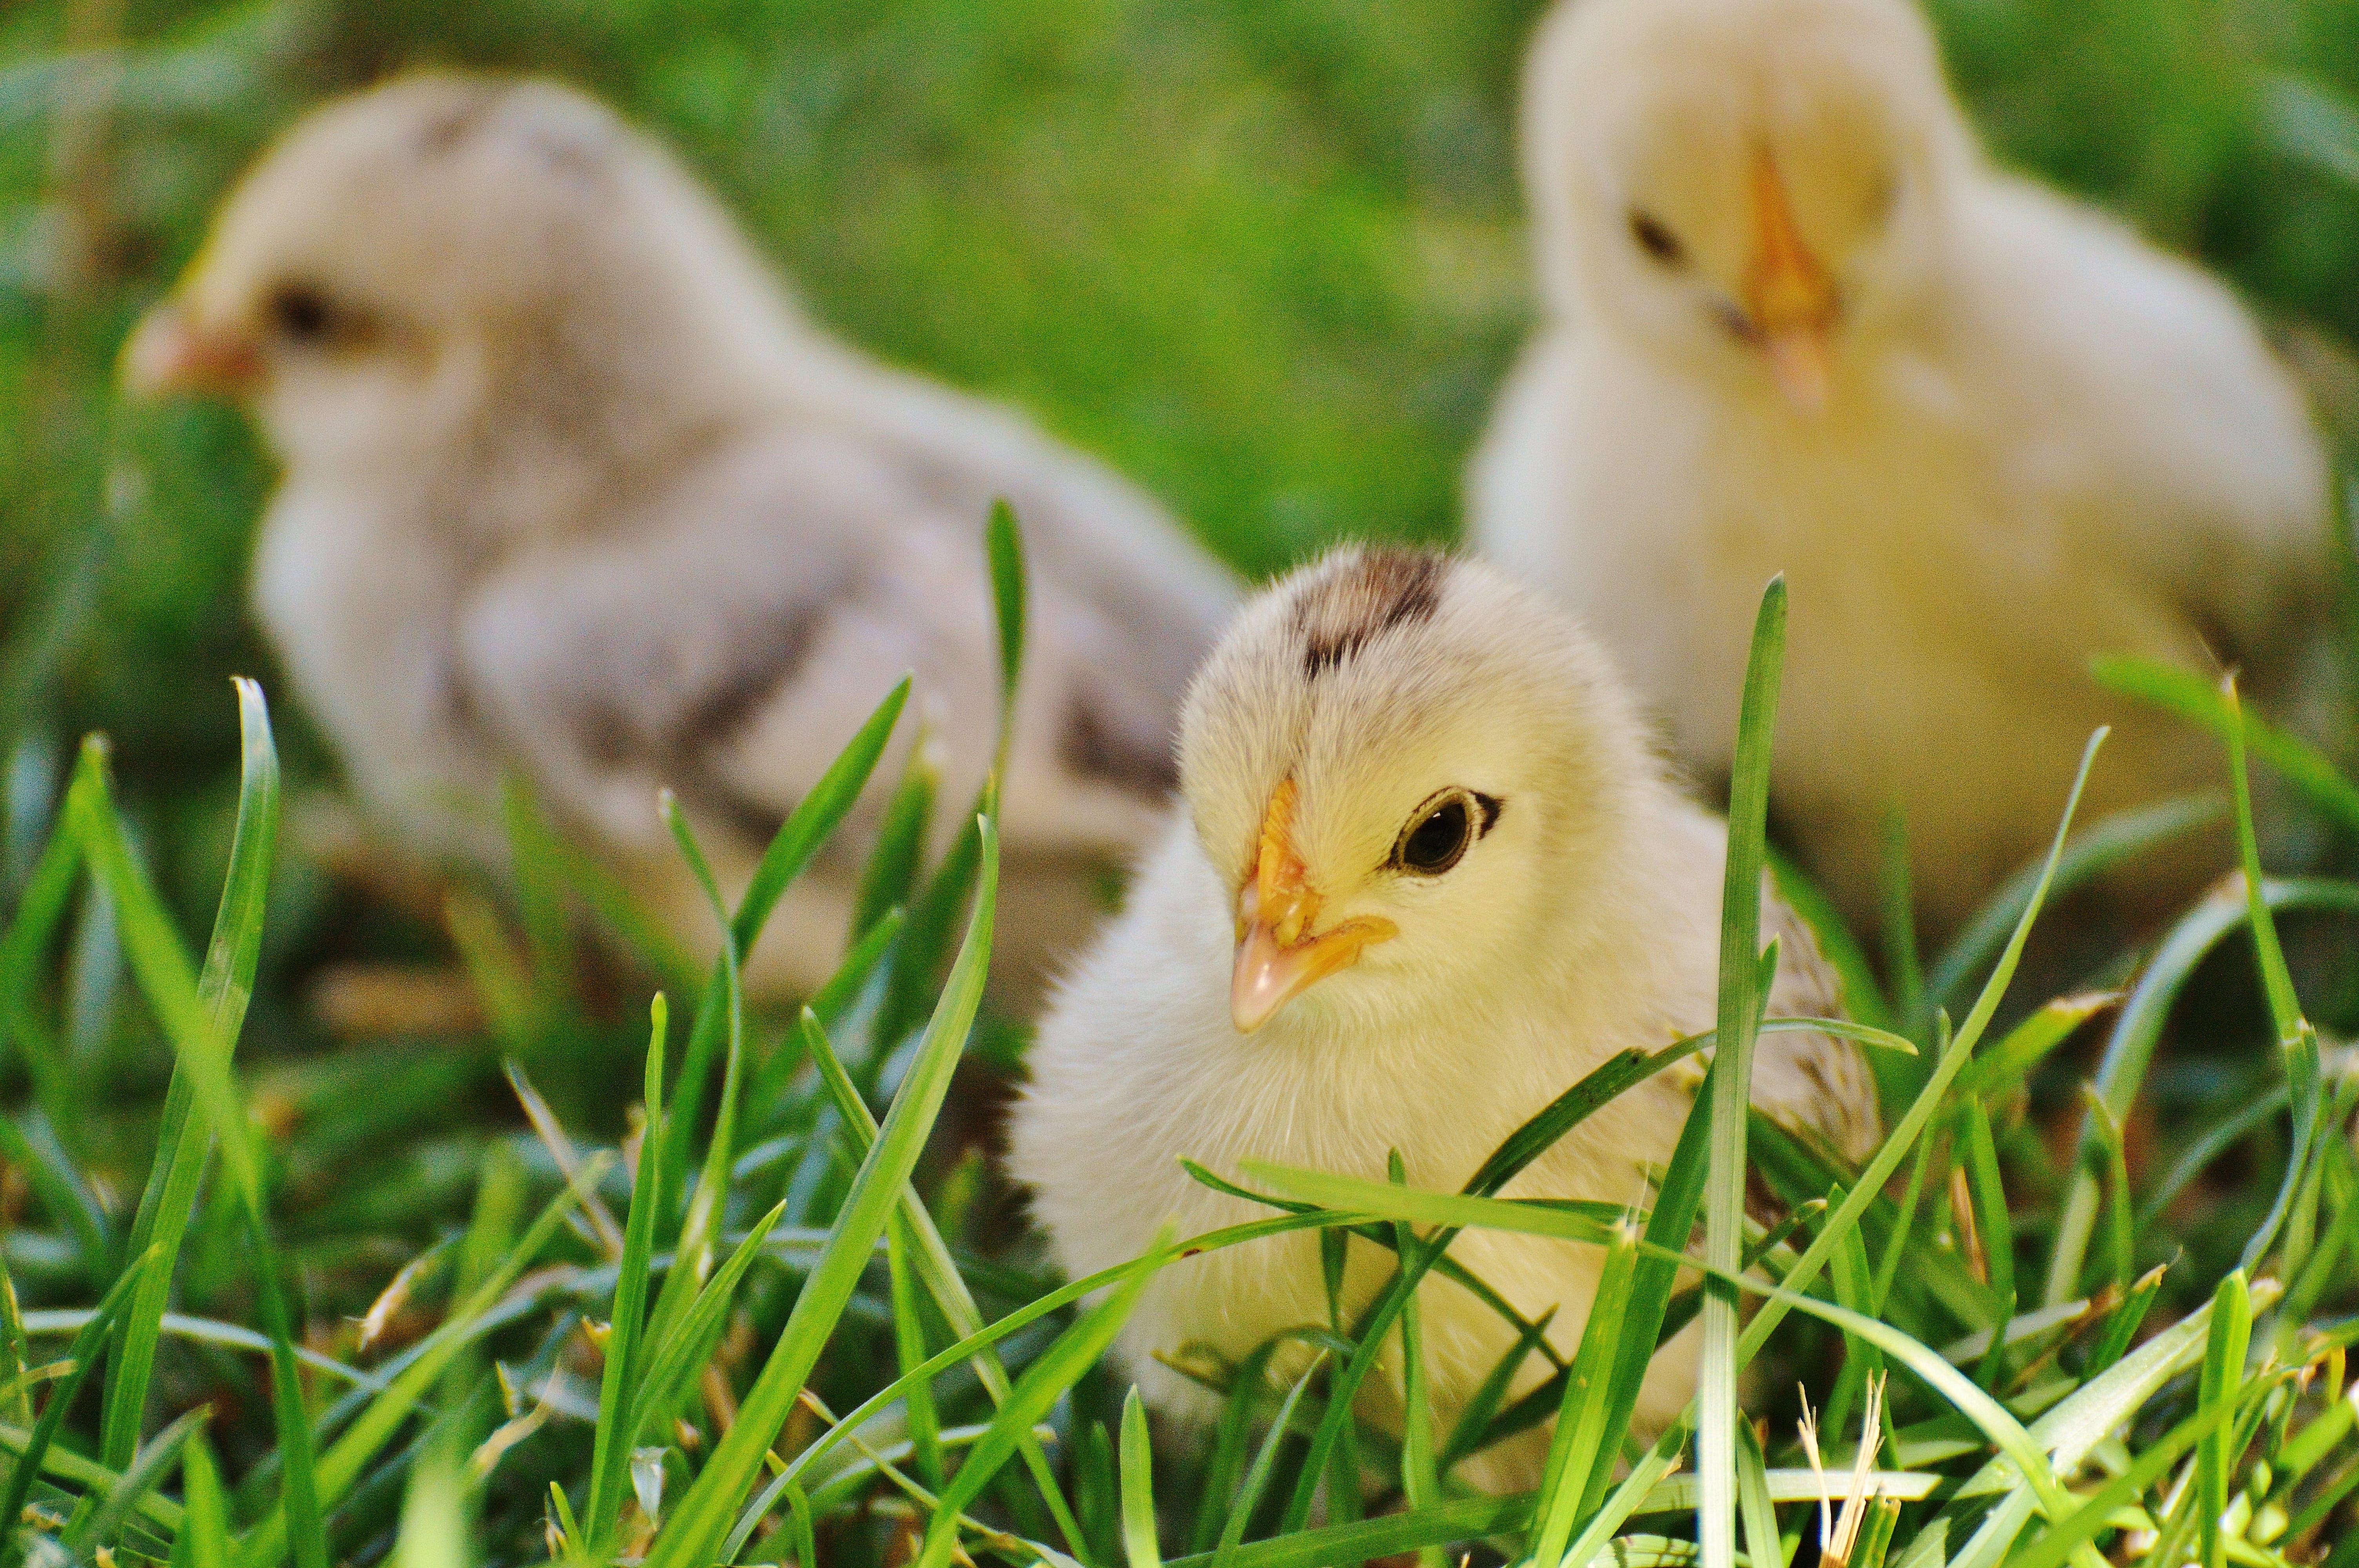 3 Chicks on Green Grass